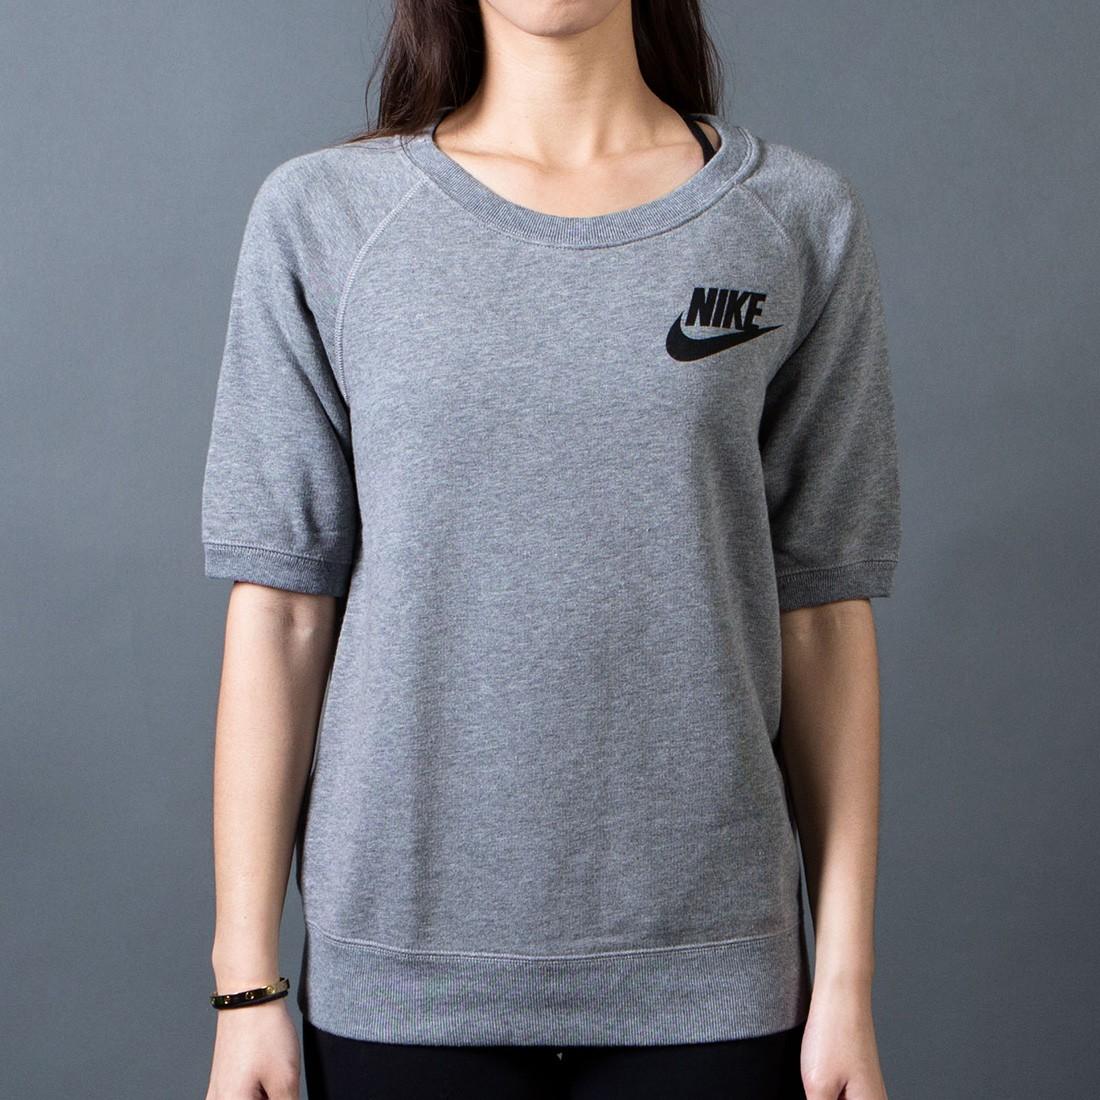 Nike Women Rally Crew Tee (grey  /  carbon heather / black)